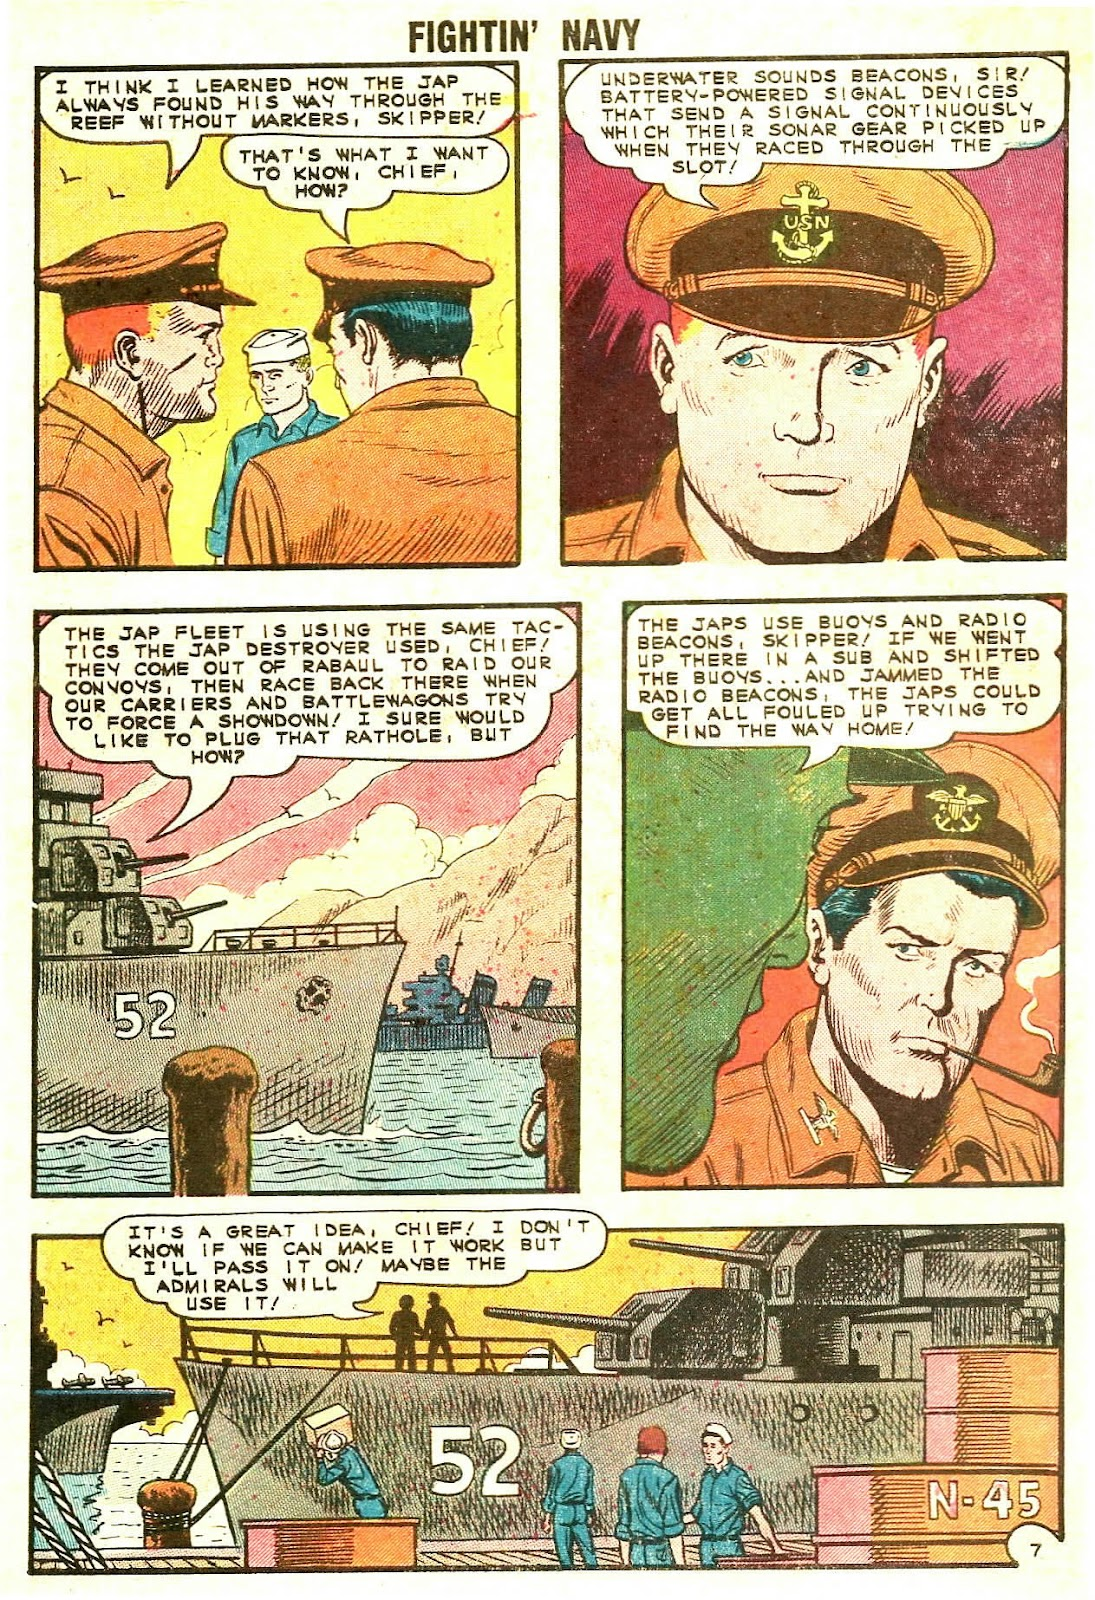 Read online Fightin' Navy comic -  Issue #120 - 10